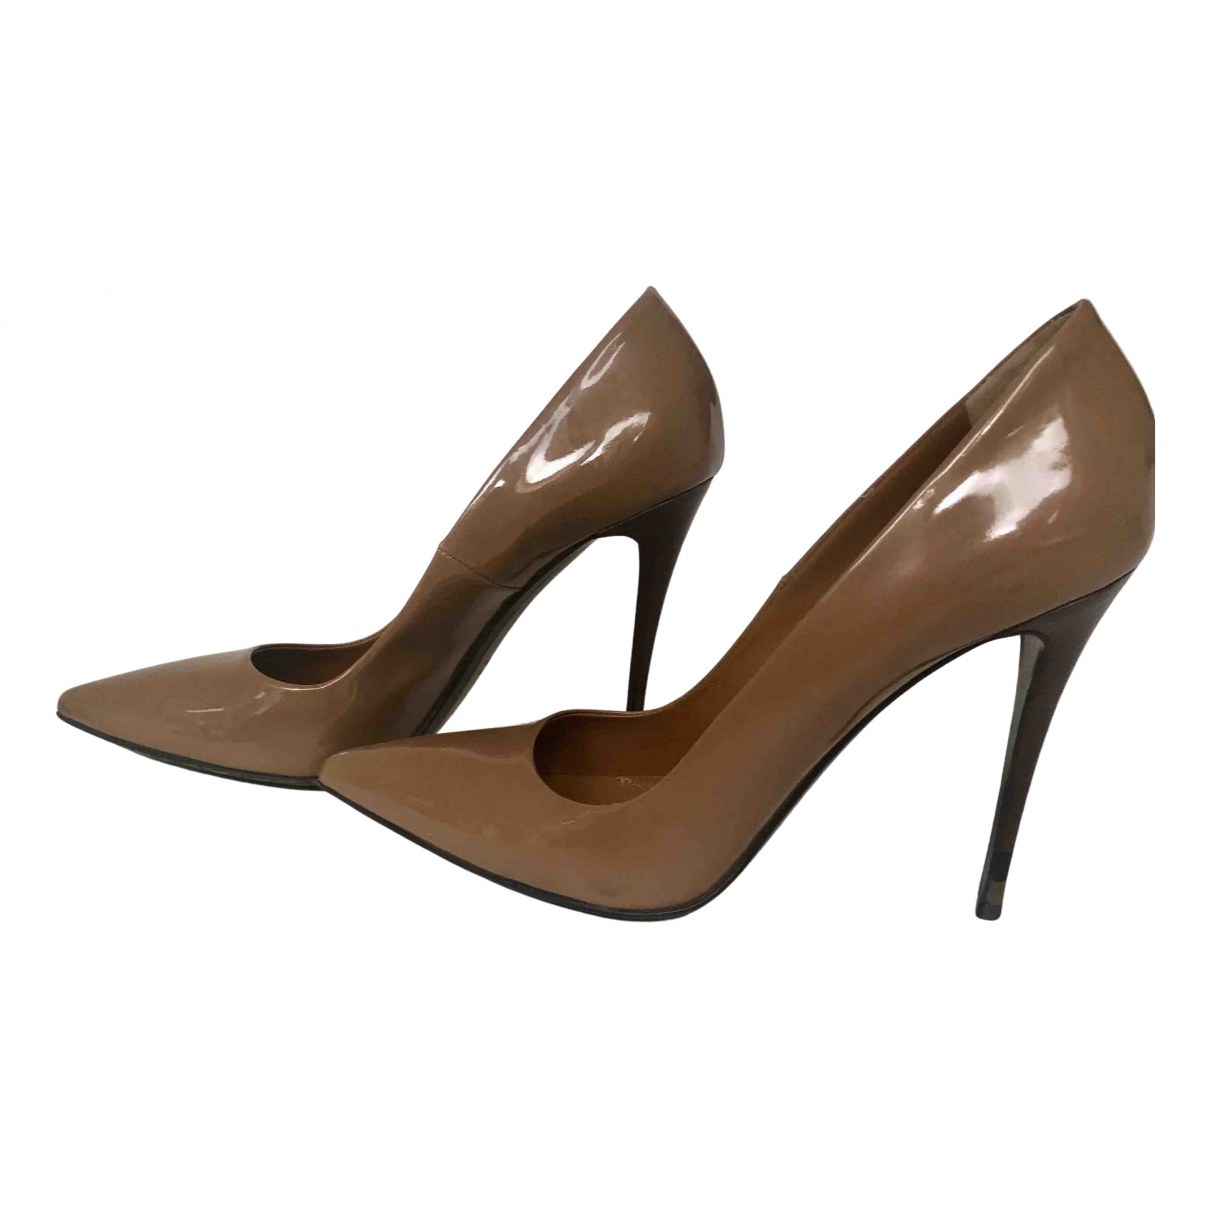 Fendi N Camel Patent leather Heels for Women 37 EU